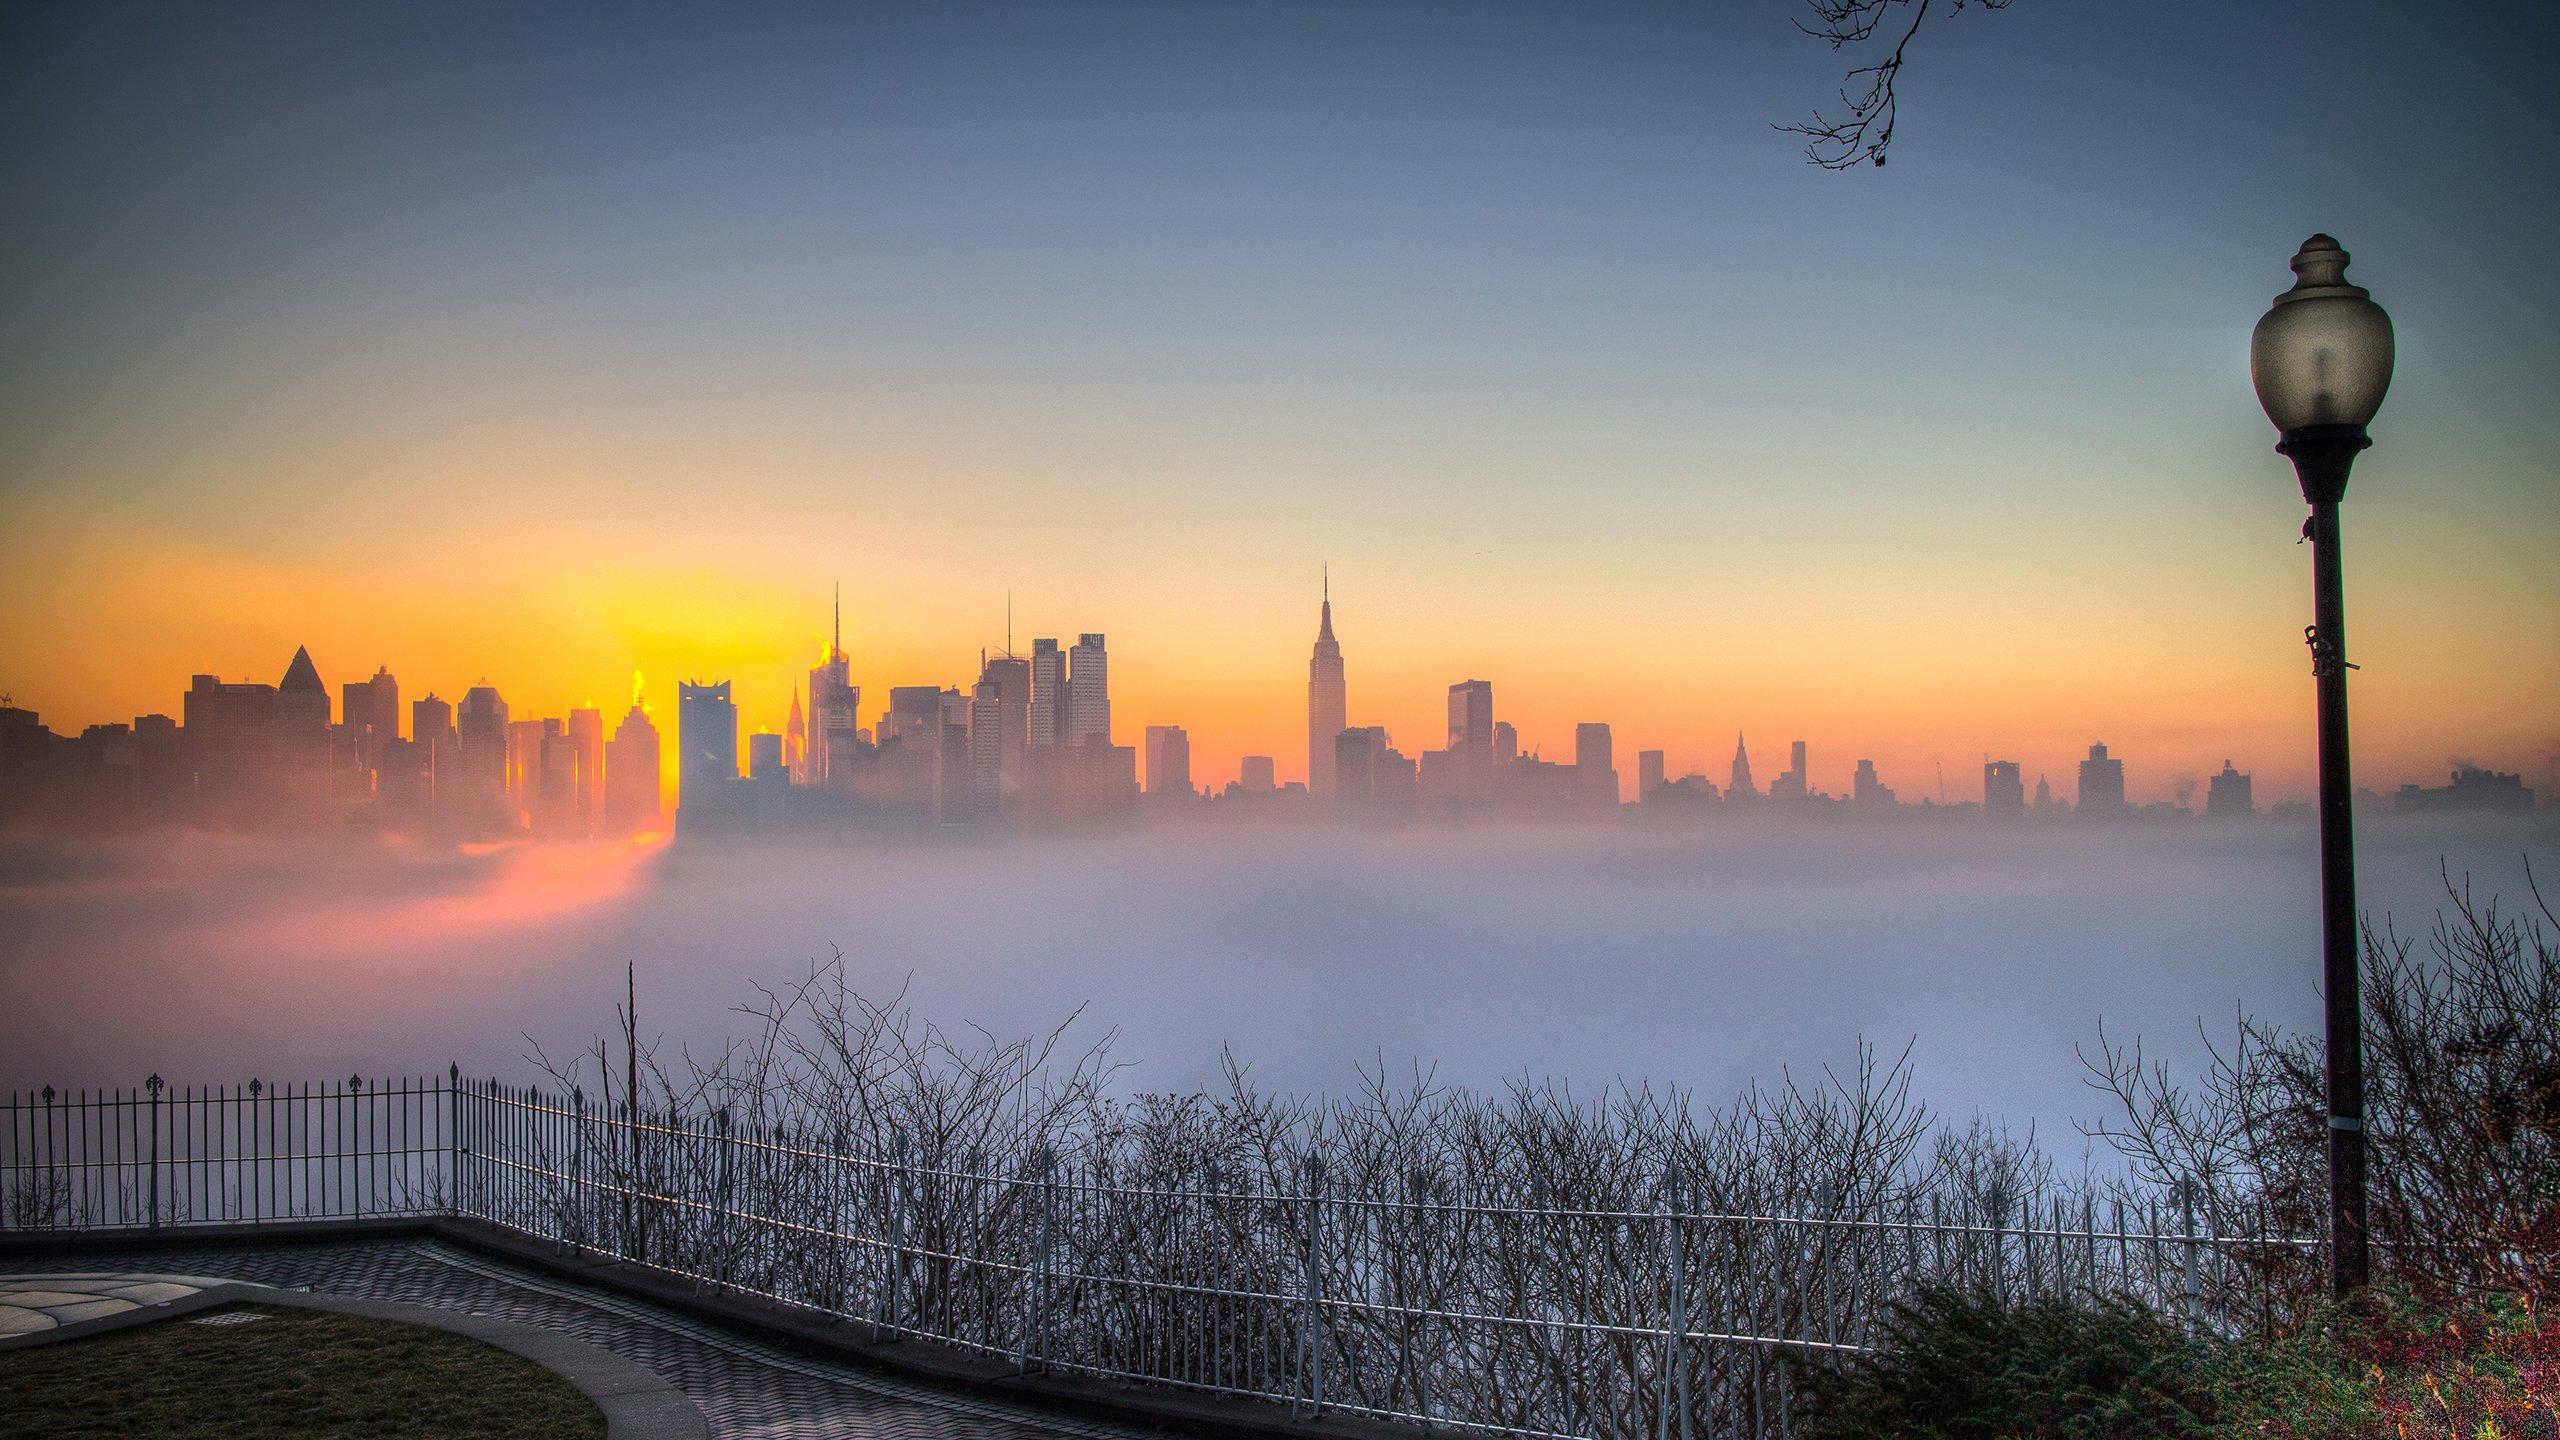 New York Buildings Skyscrapers Fog Mist Sunset Wallpaper